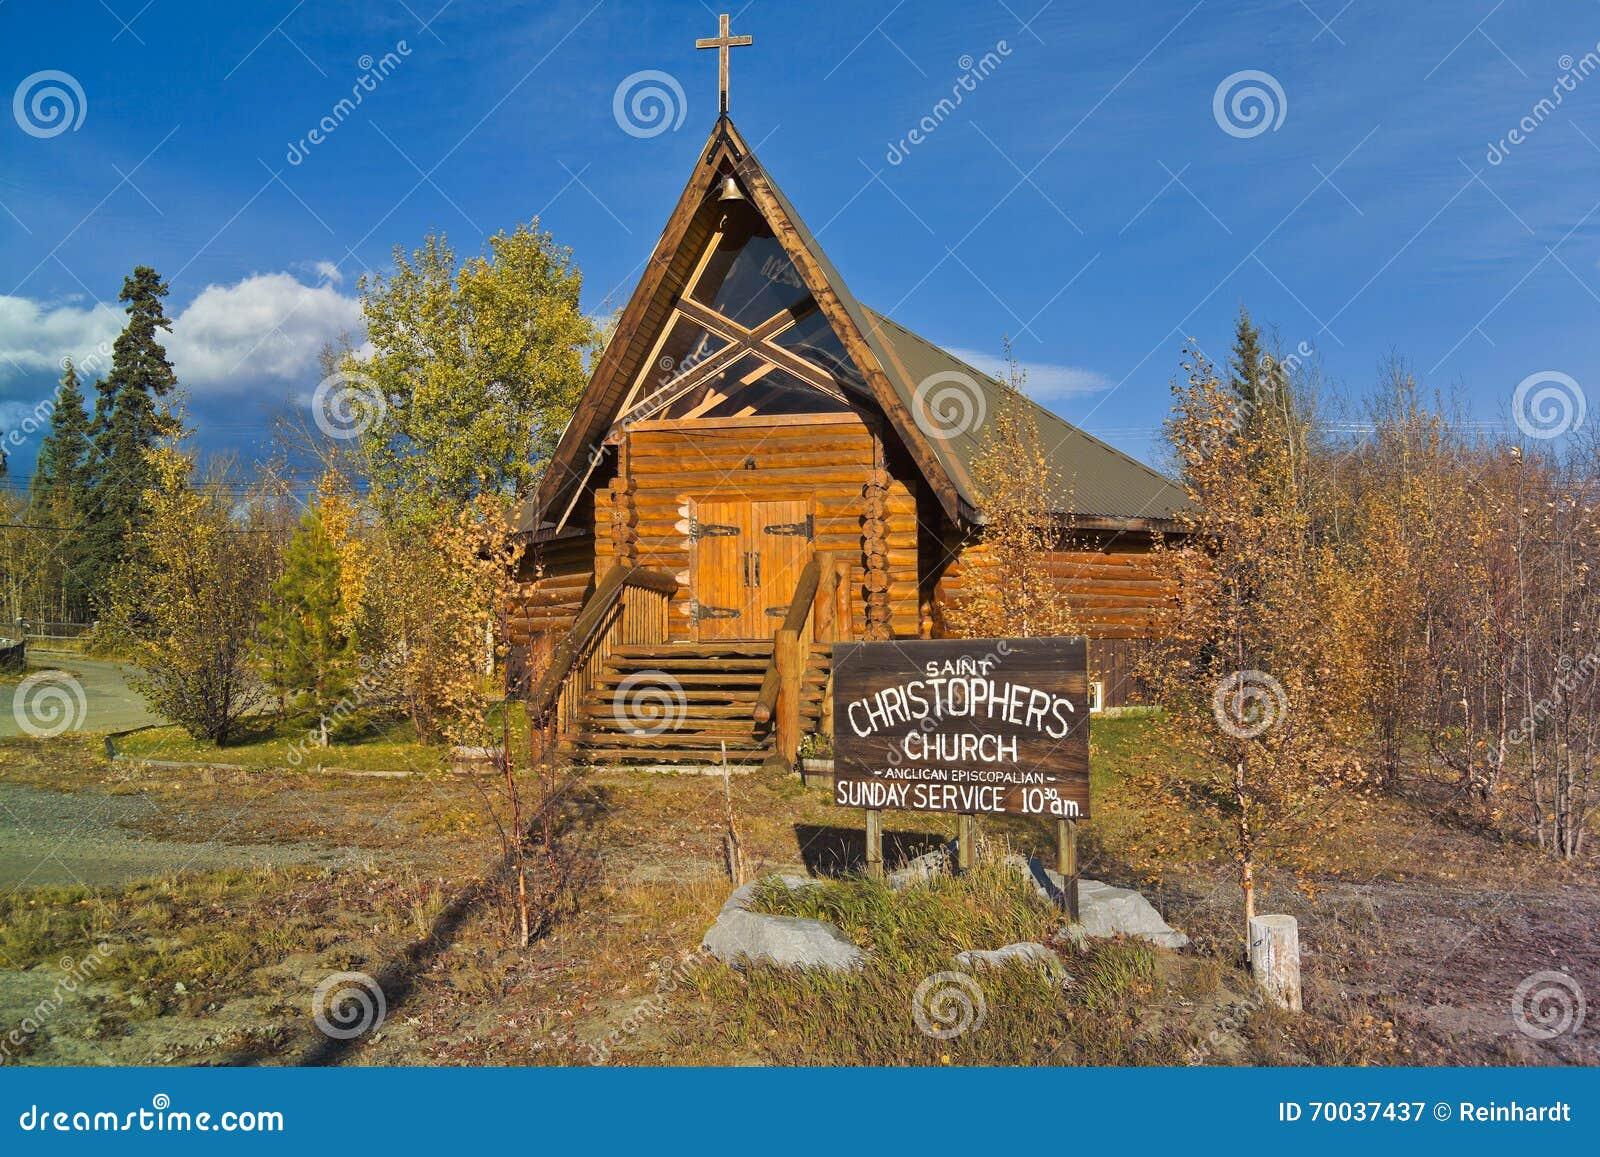 Can 1888-06 Log church, Haines Junction, Yukon, Canada